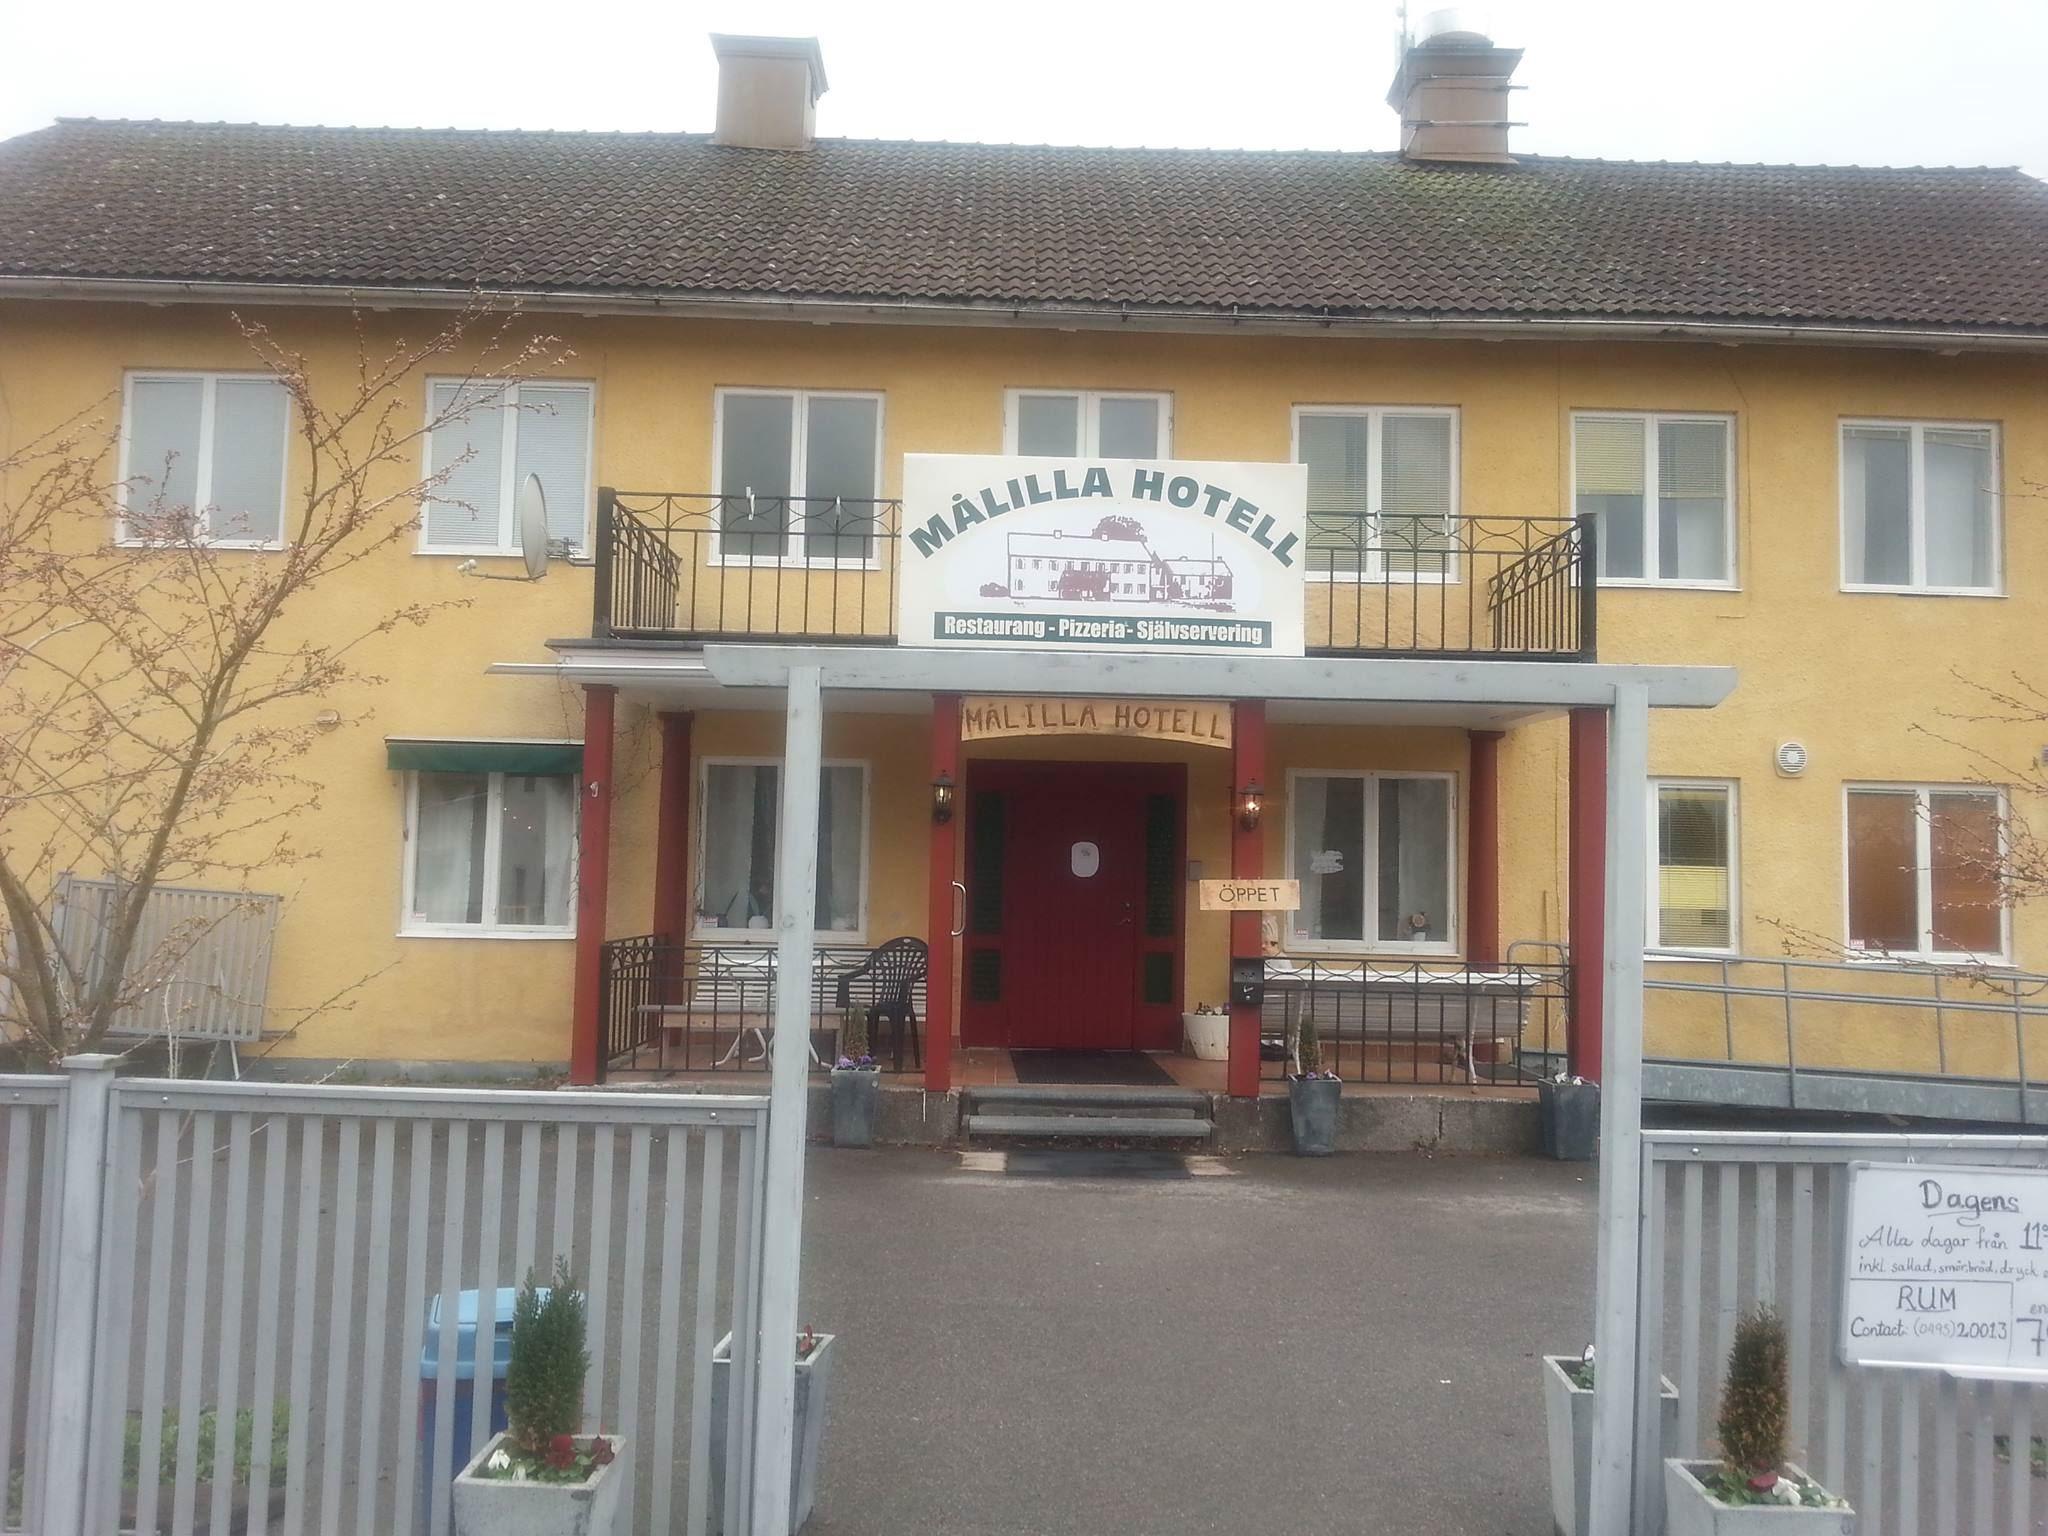 Målilla Hotel